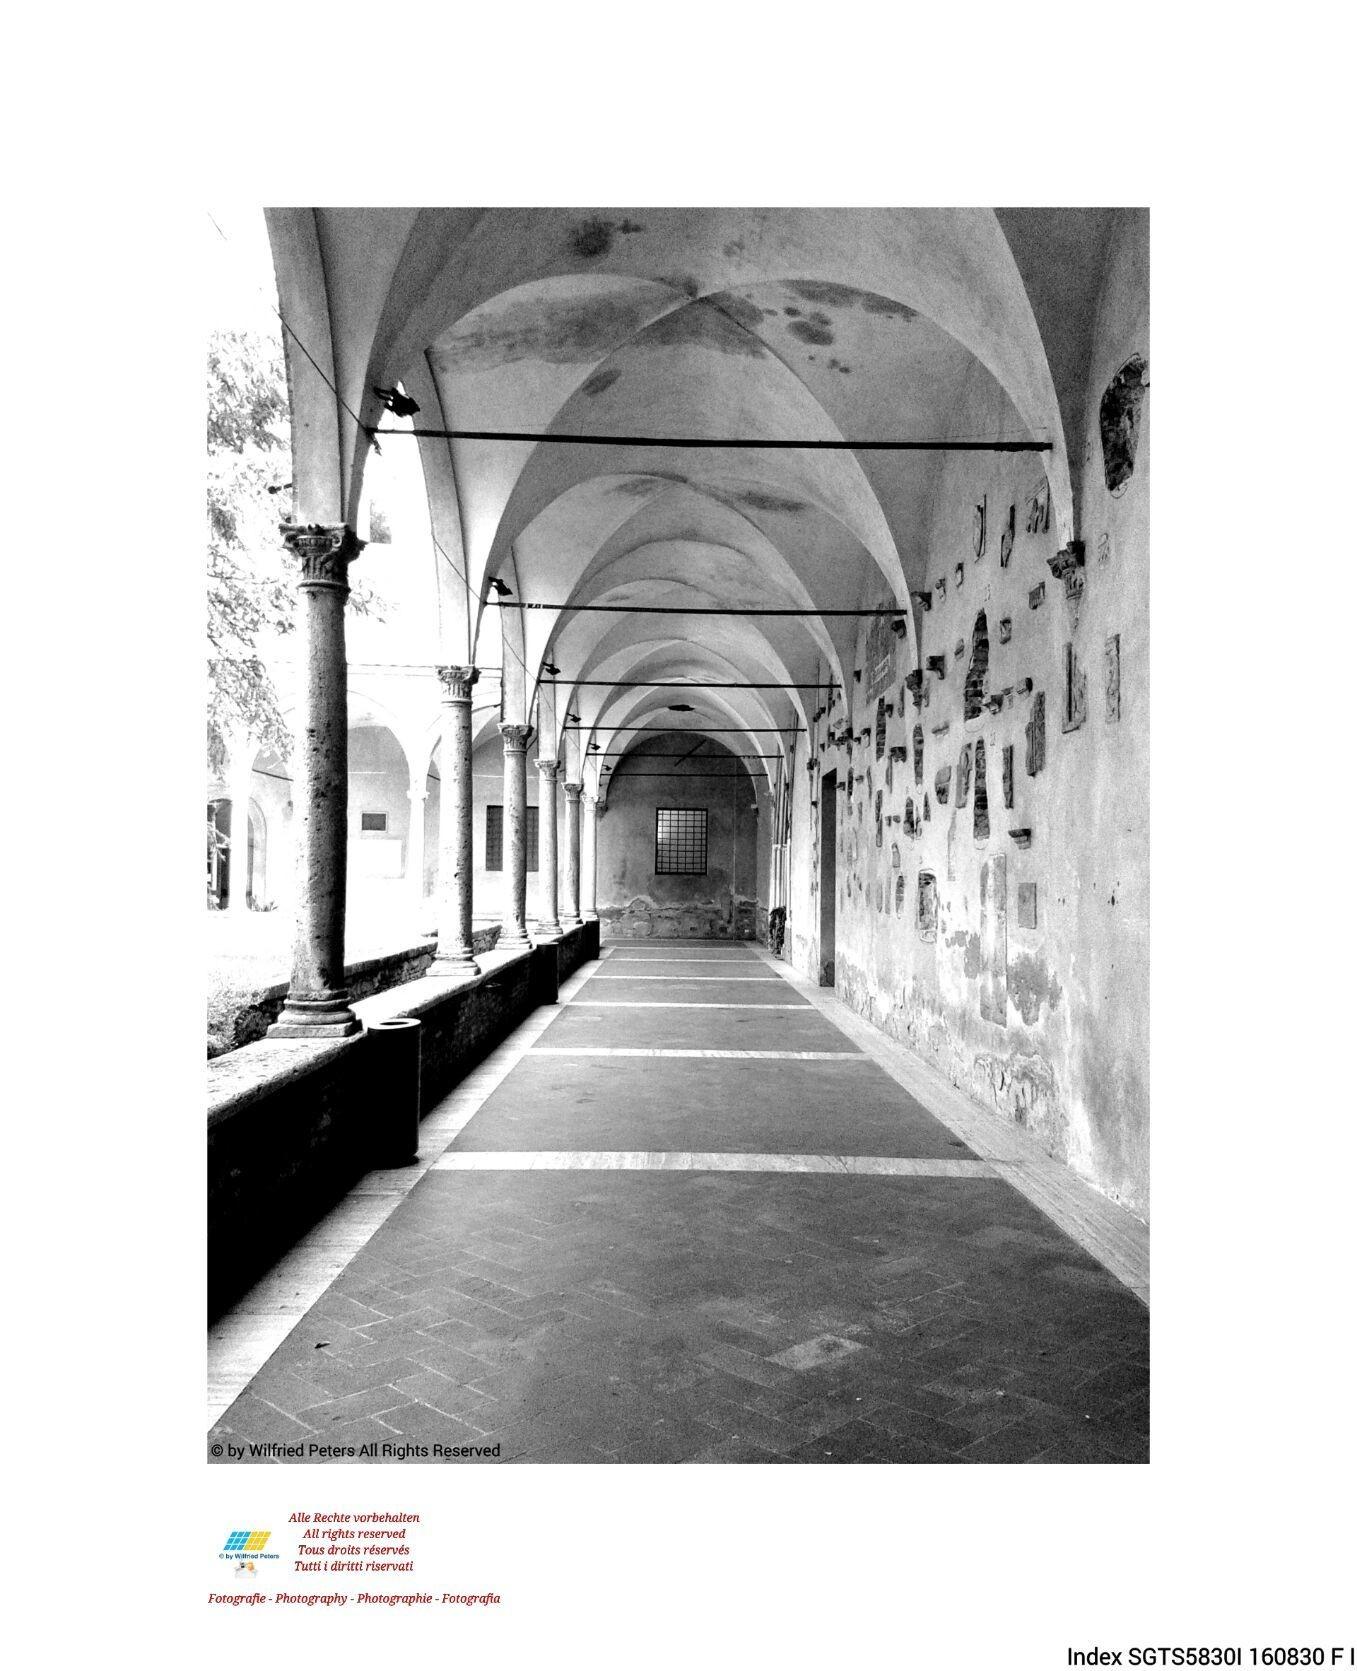 #Fotografie #Photography #Photographie #Fotografia #schwarzweiss #blackandwhite #noiretblanc #biancoenero #Italien #Italy #Italie #Italia #Kreuzgang #Cloister #Cloître #Chiostro